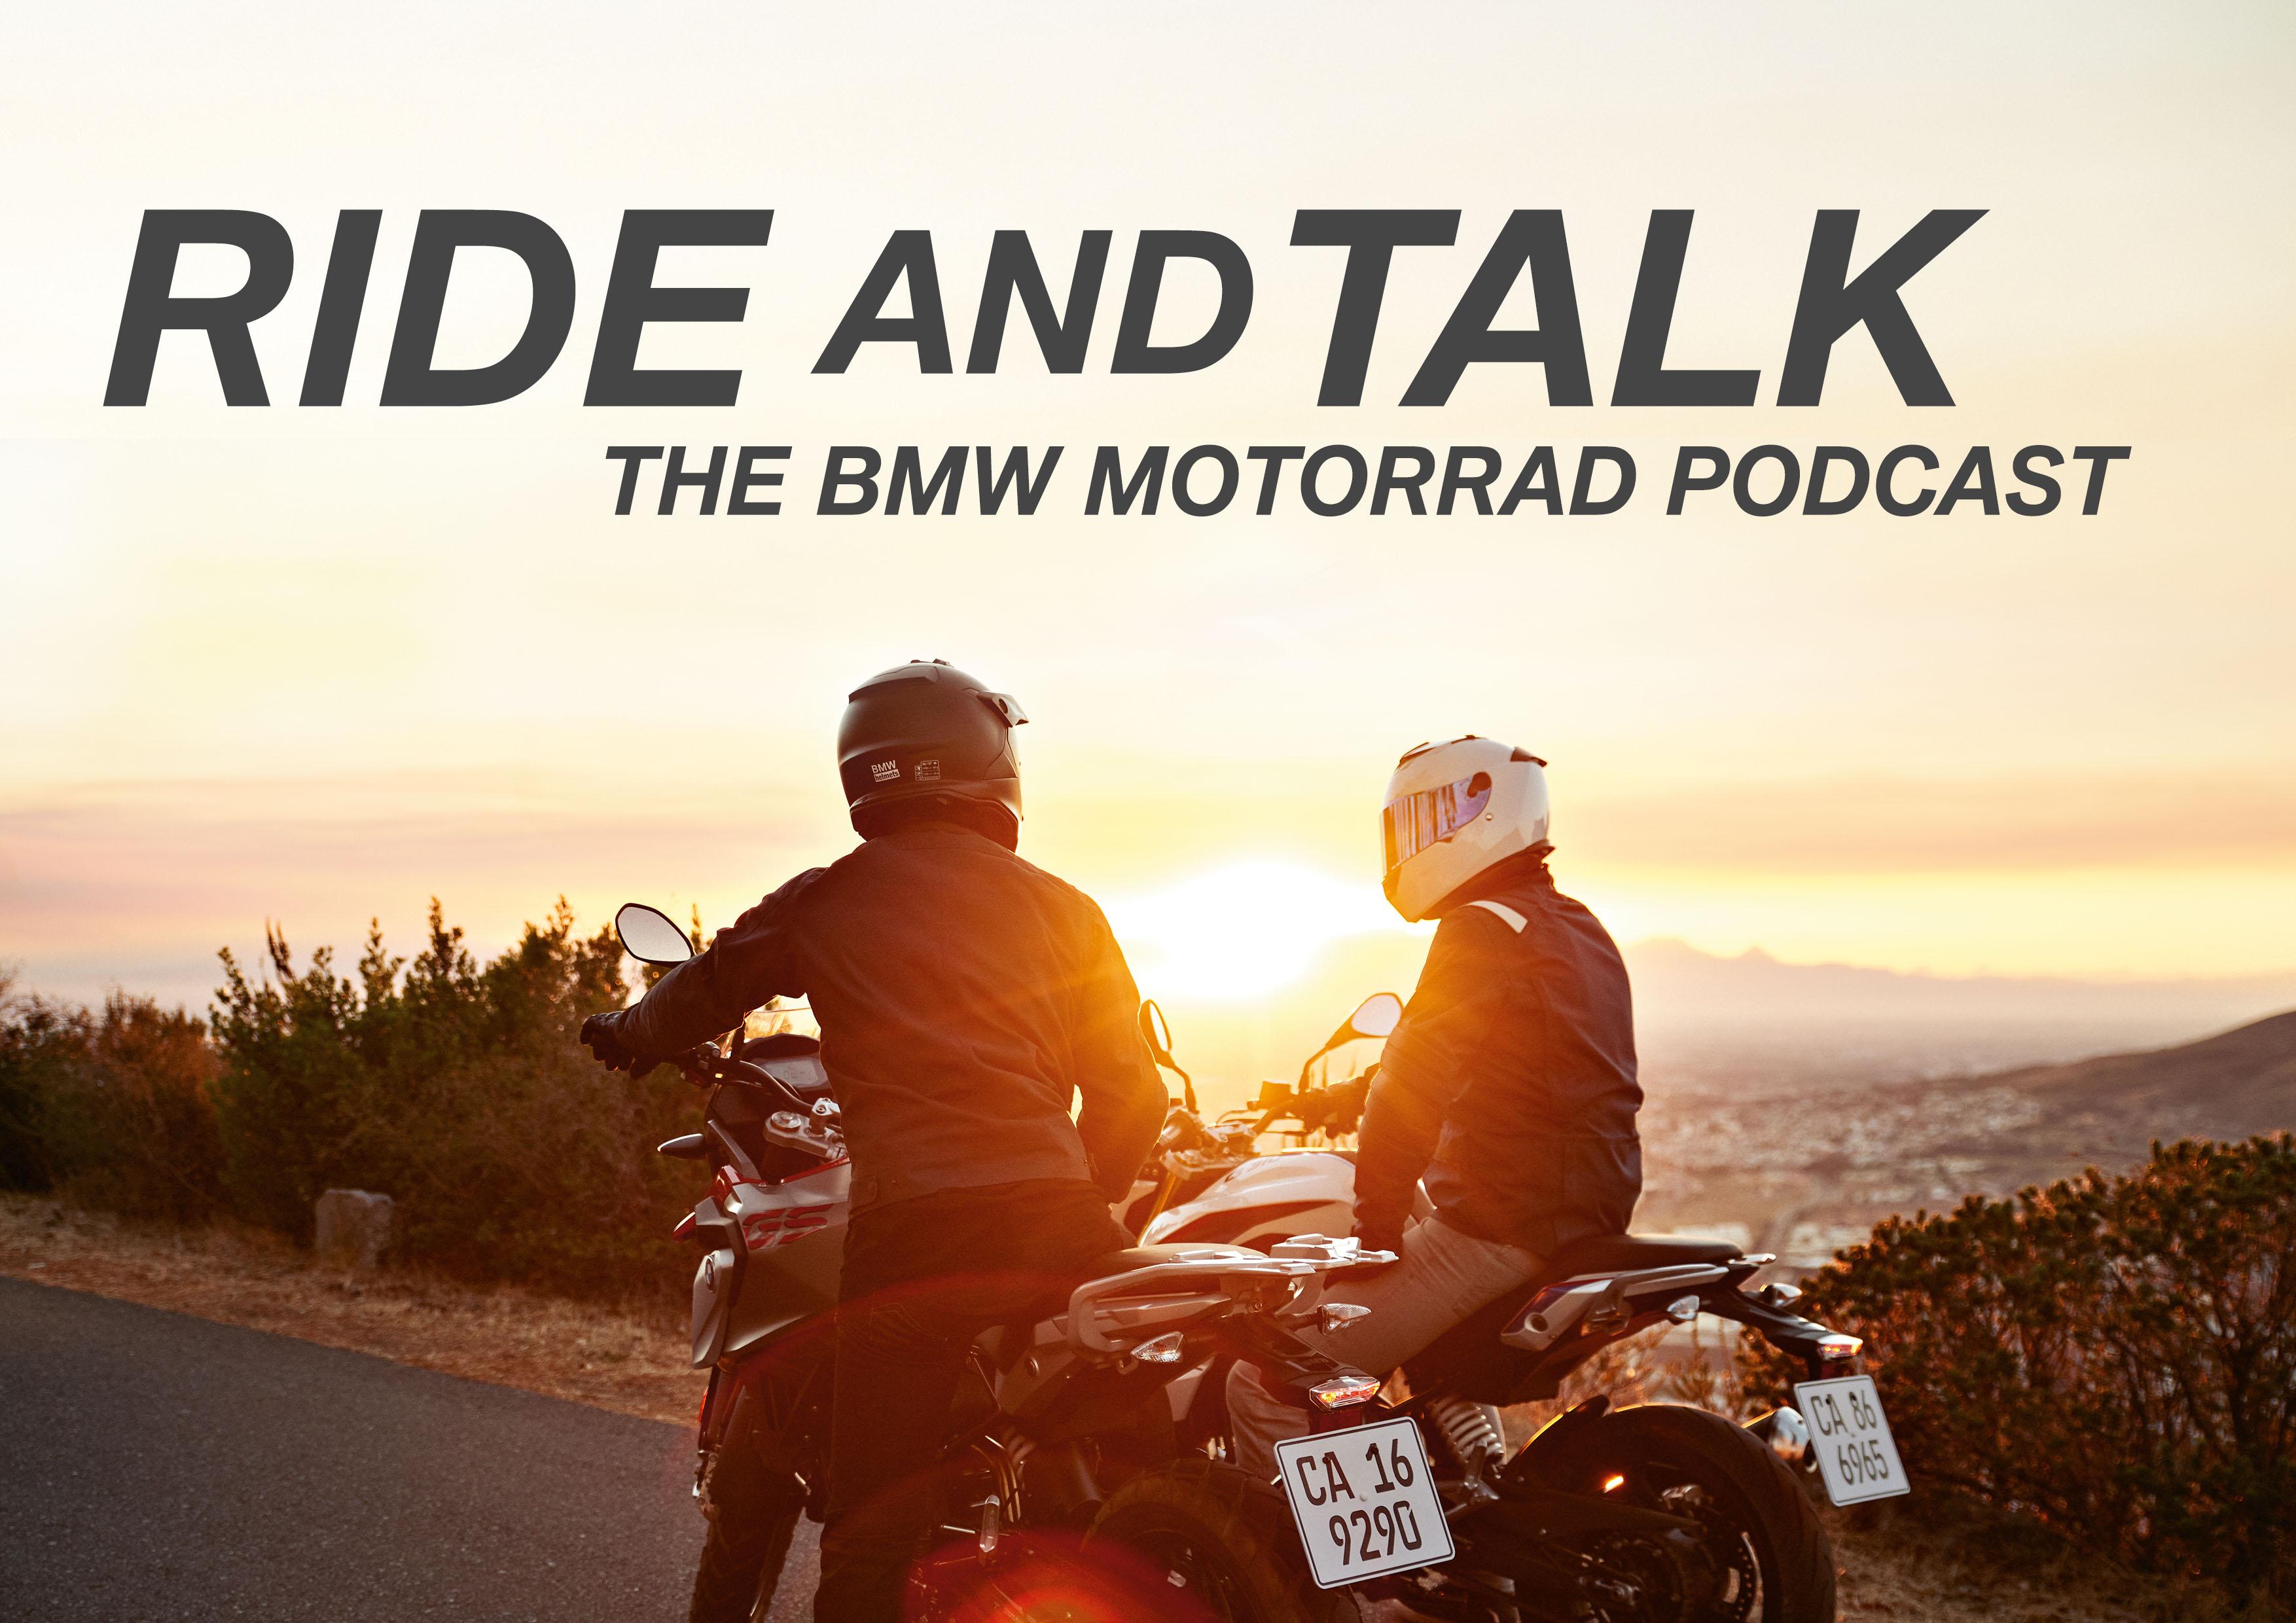 BMW Motorrad Ride and Talk Podcast